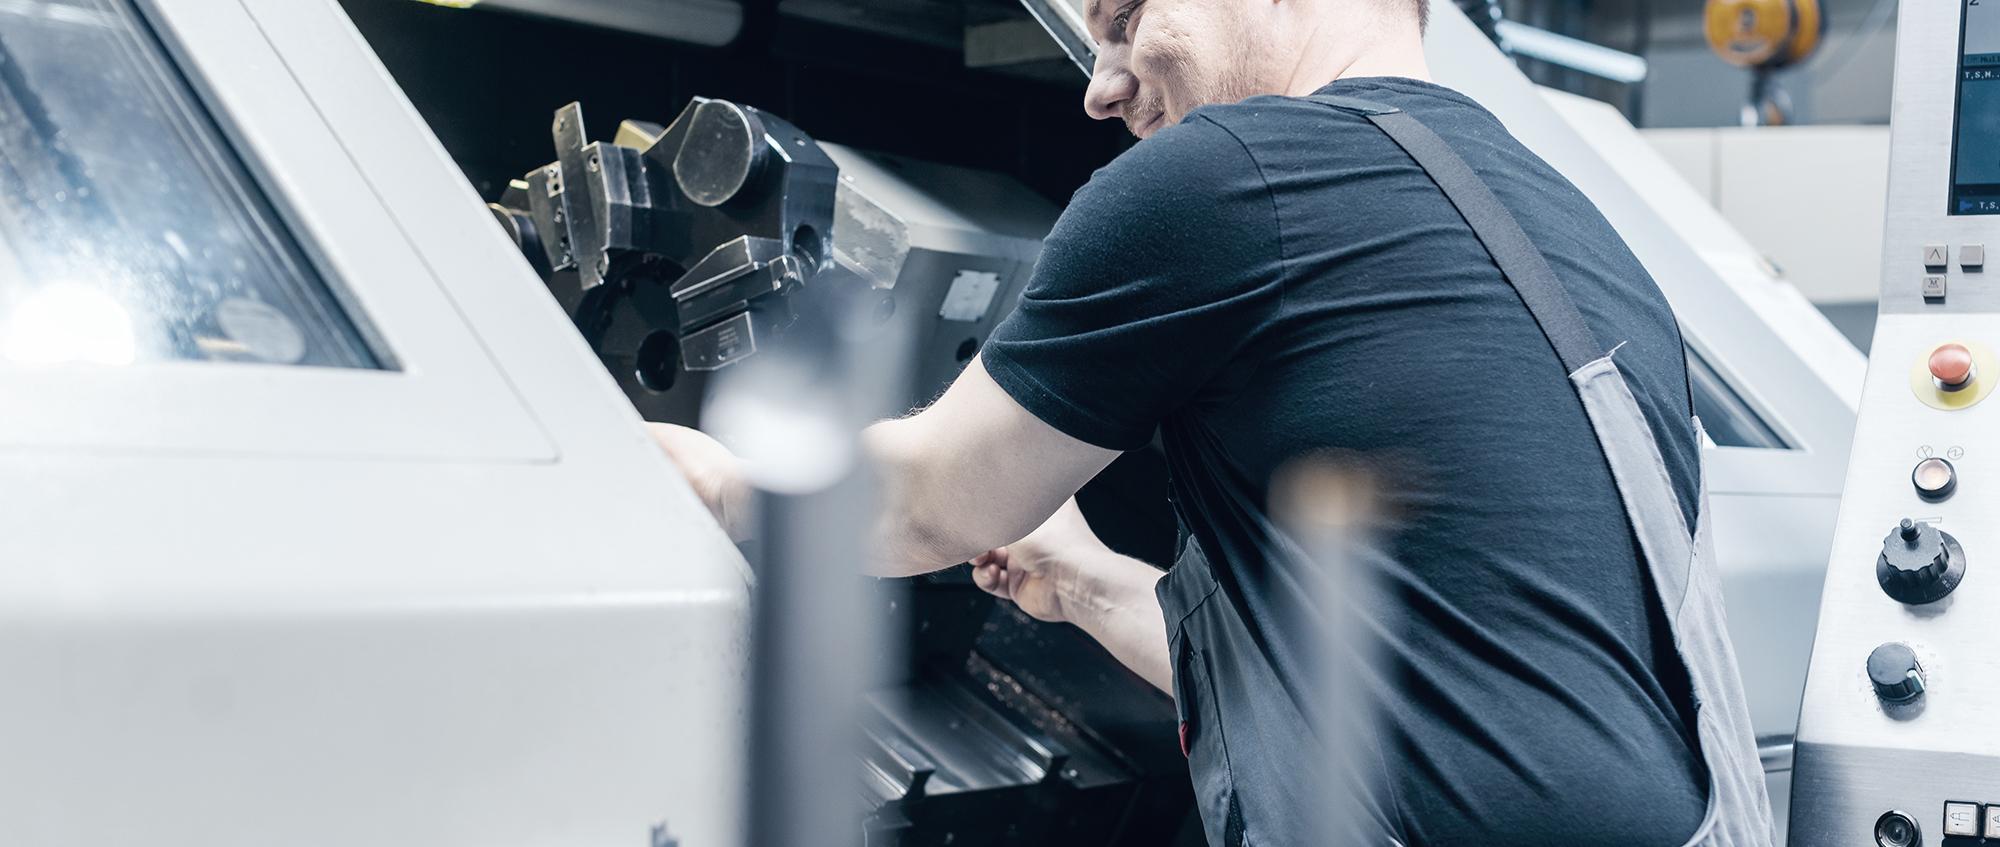 Modernste CNC Technologie bei bock machining in Alzenau